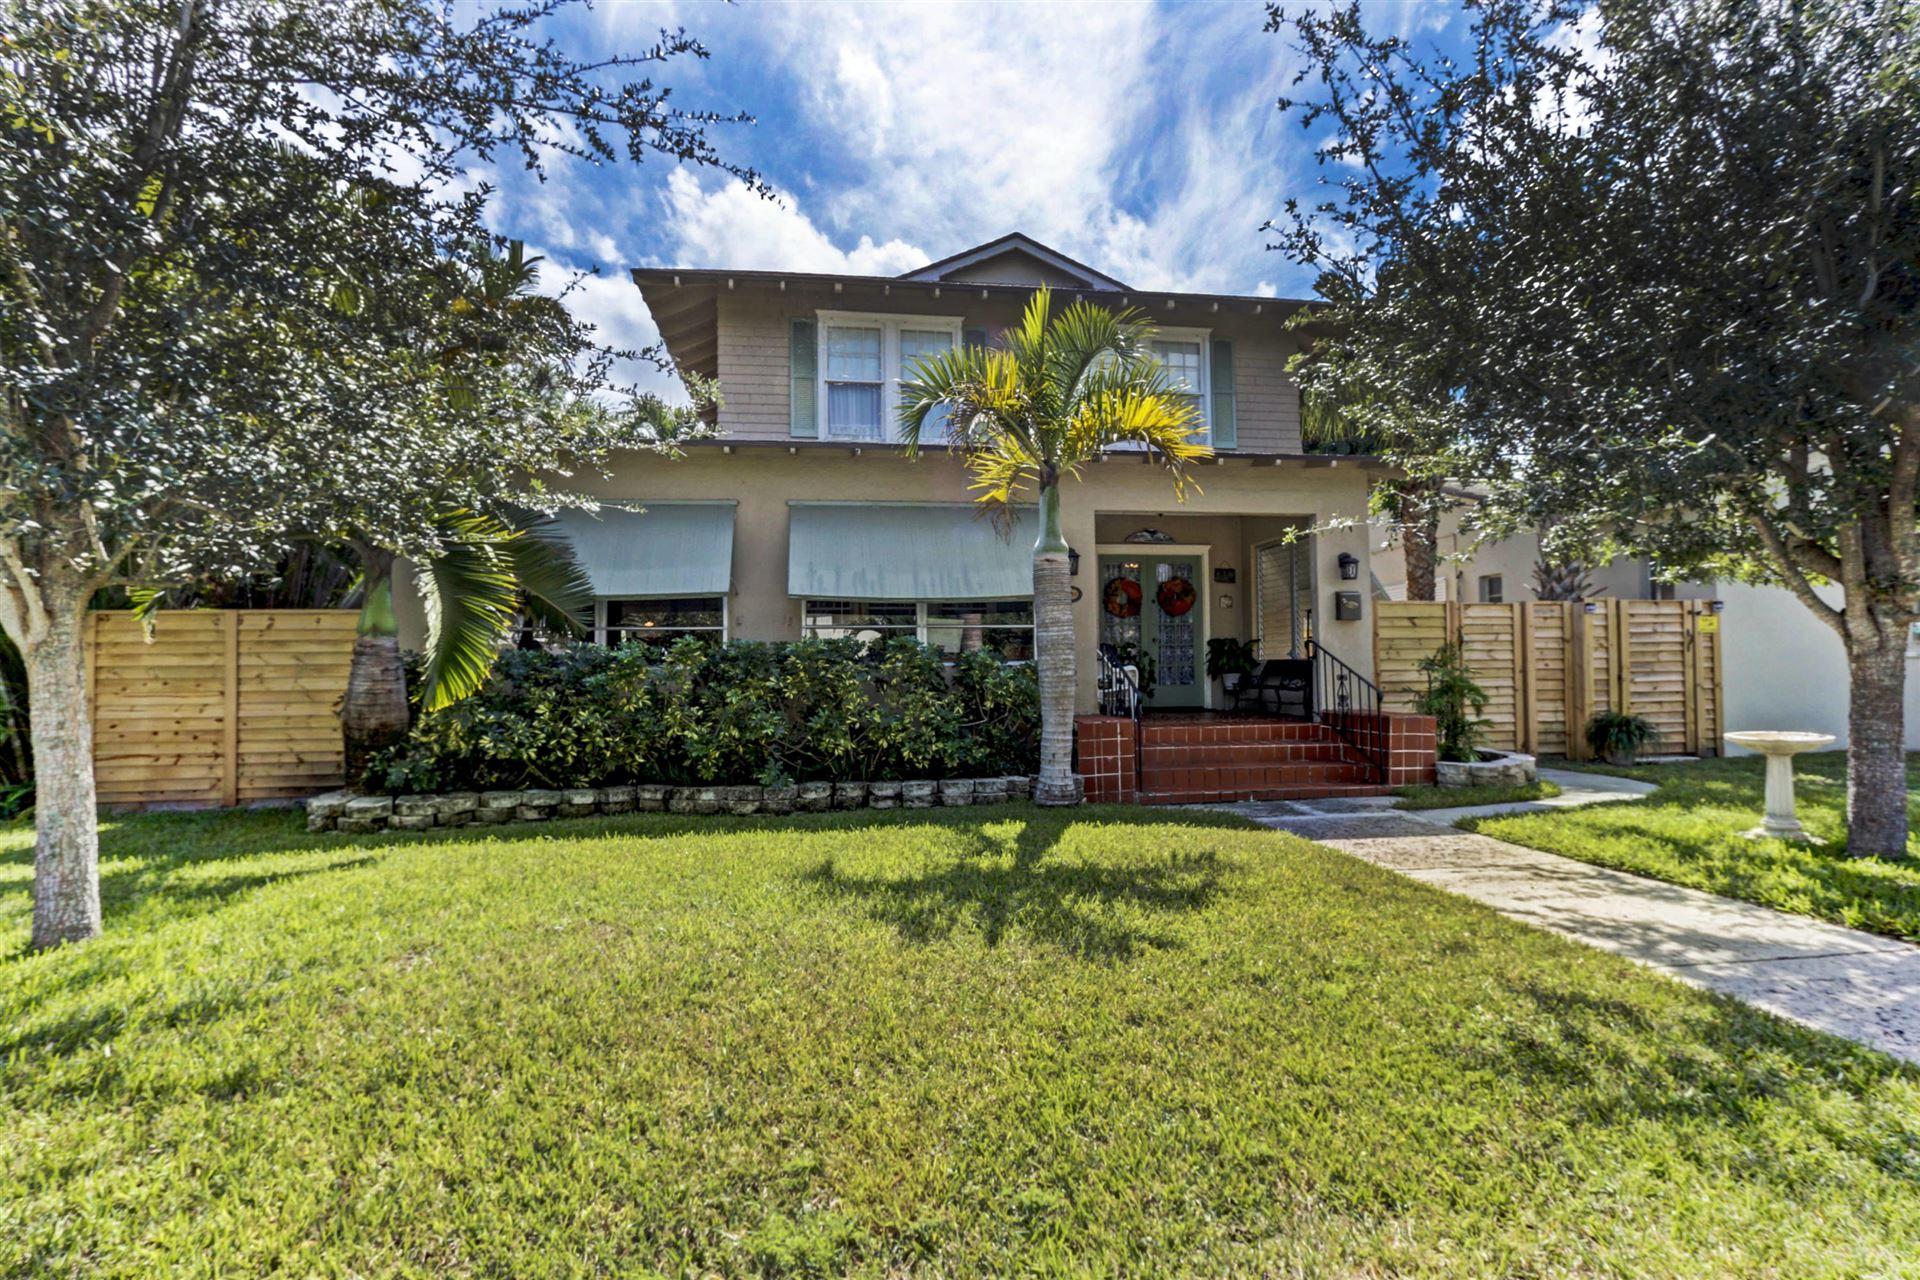 442 33rd Street, West Palm Beach, FL 33407 - MLS#: RX-10664144